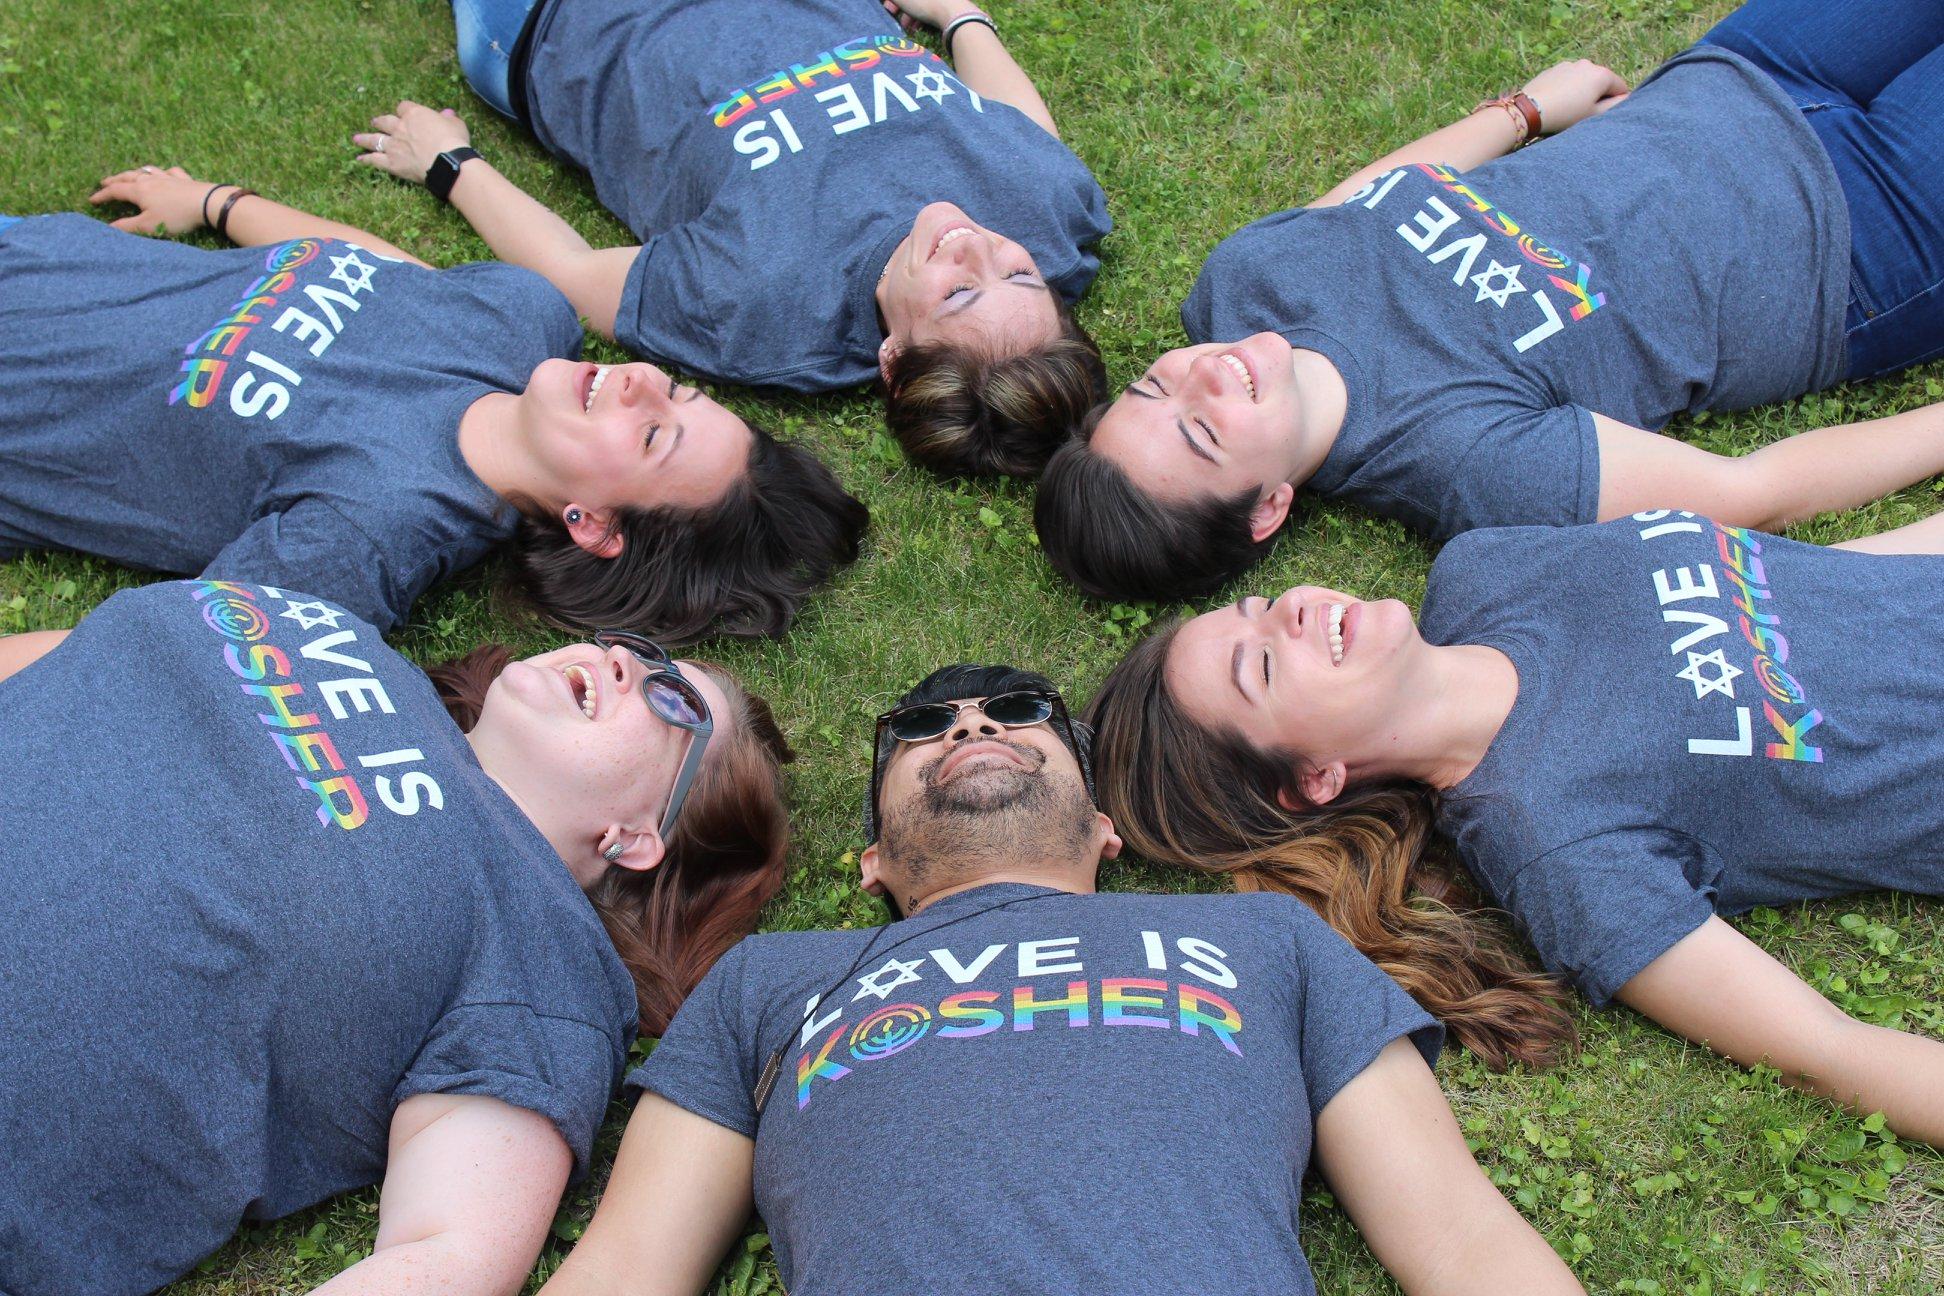 Love Is Kosher T-Shirts